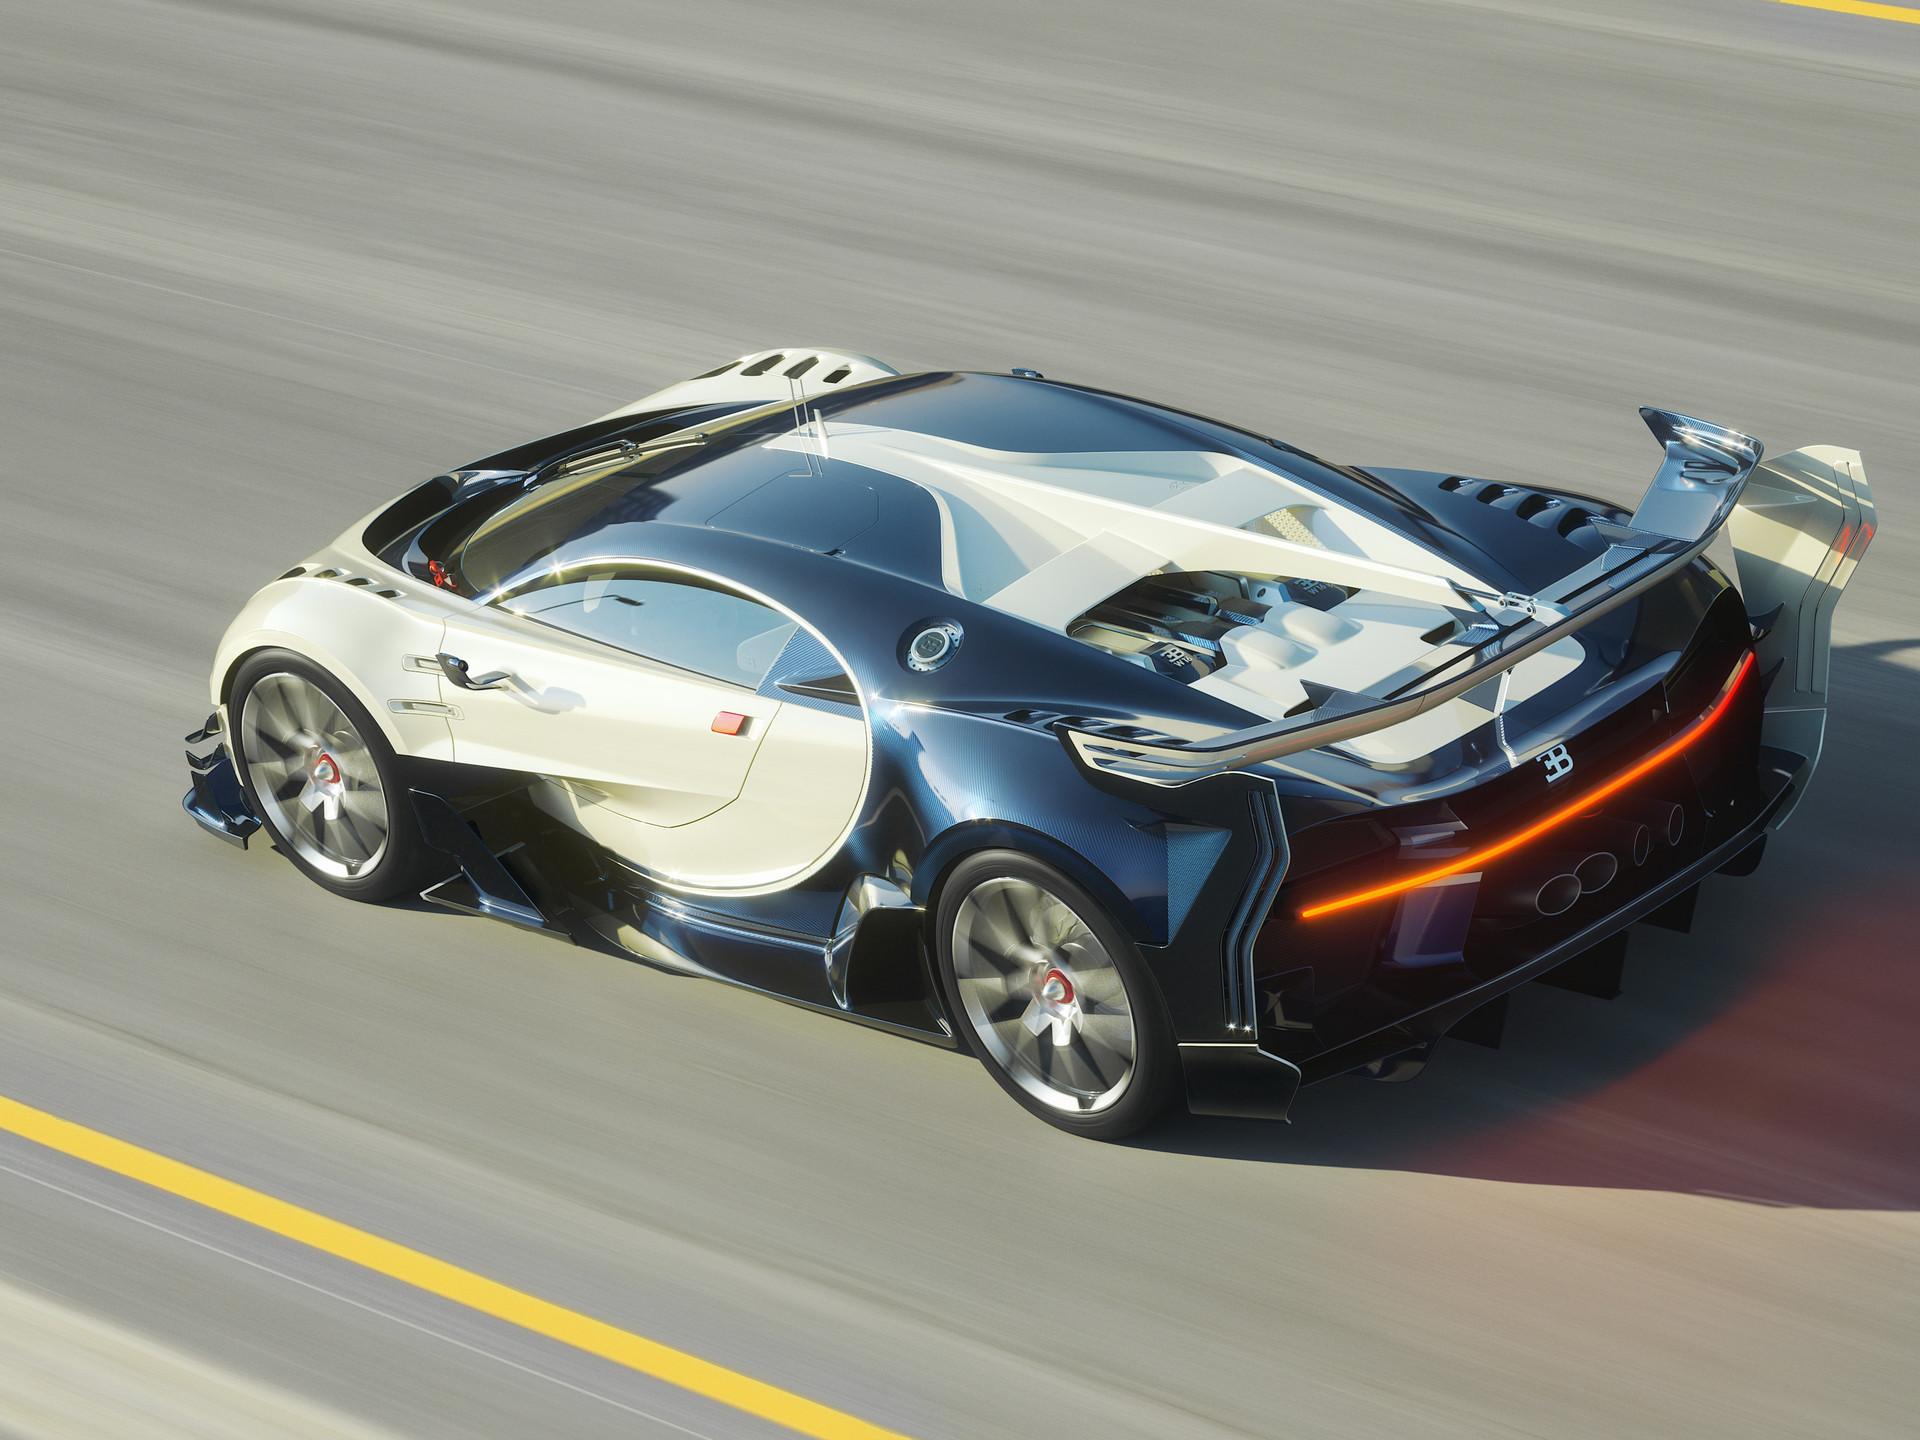 ArtStation - 2016 Bugatti Vision Gran Turismo Concept CGI, Kantemir on ford gt wallpaper hd, nissan gt wallpaper hd, mustang gt wallpaper hd, bmw gt wallpaper hd, mercedes amg gt wallpaper hd,